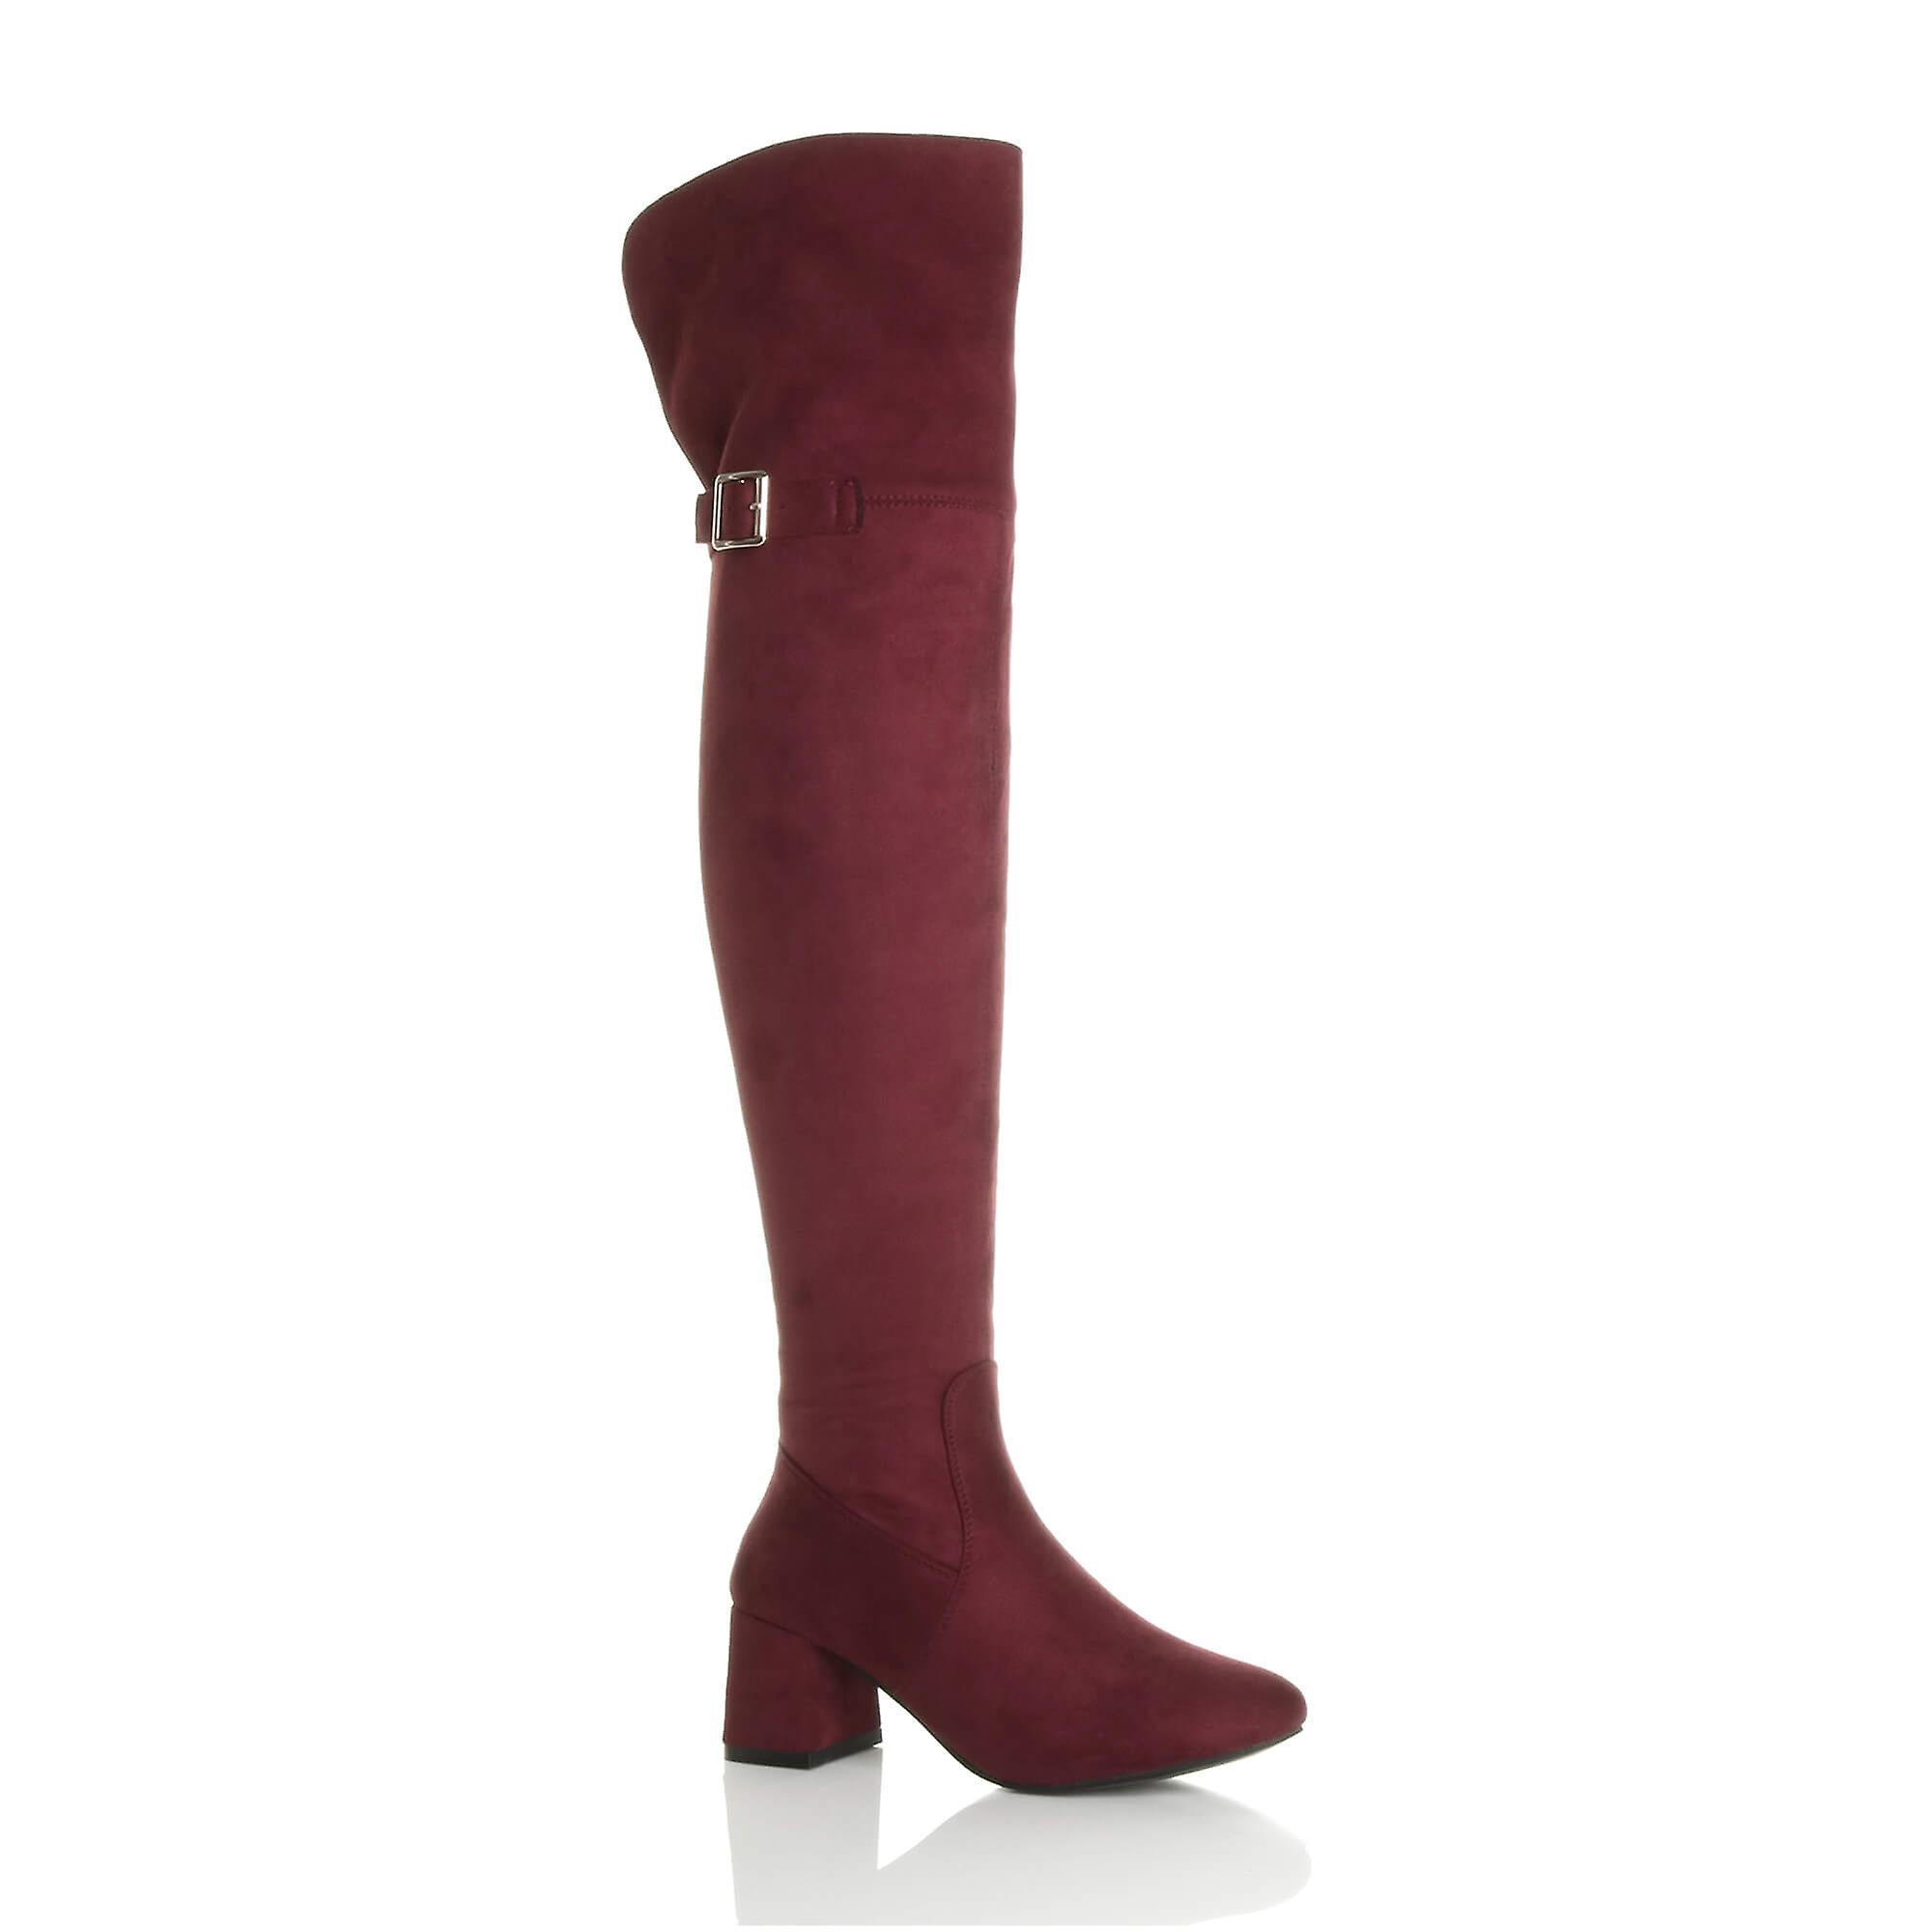 over womens cuff high boots mid fold Ajvani knee block heel zip over buckle the 6zxMCw8qd